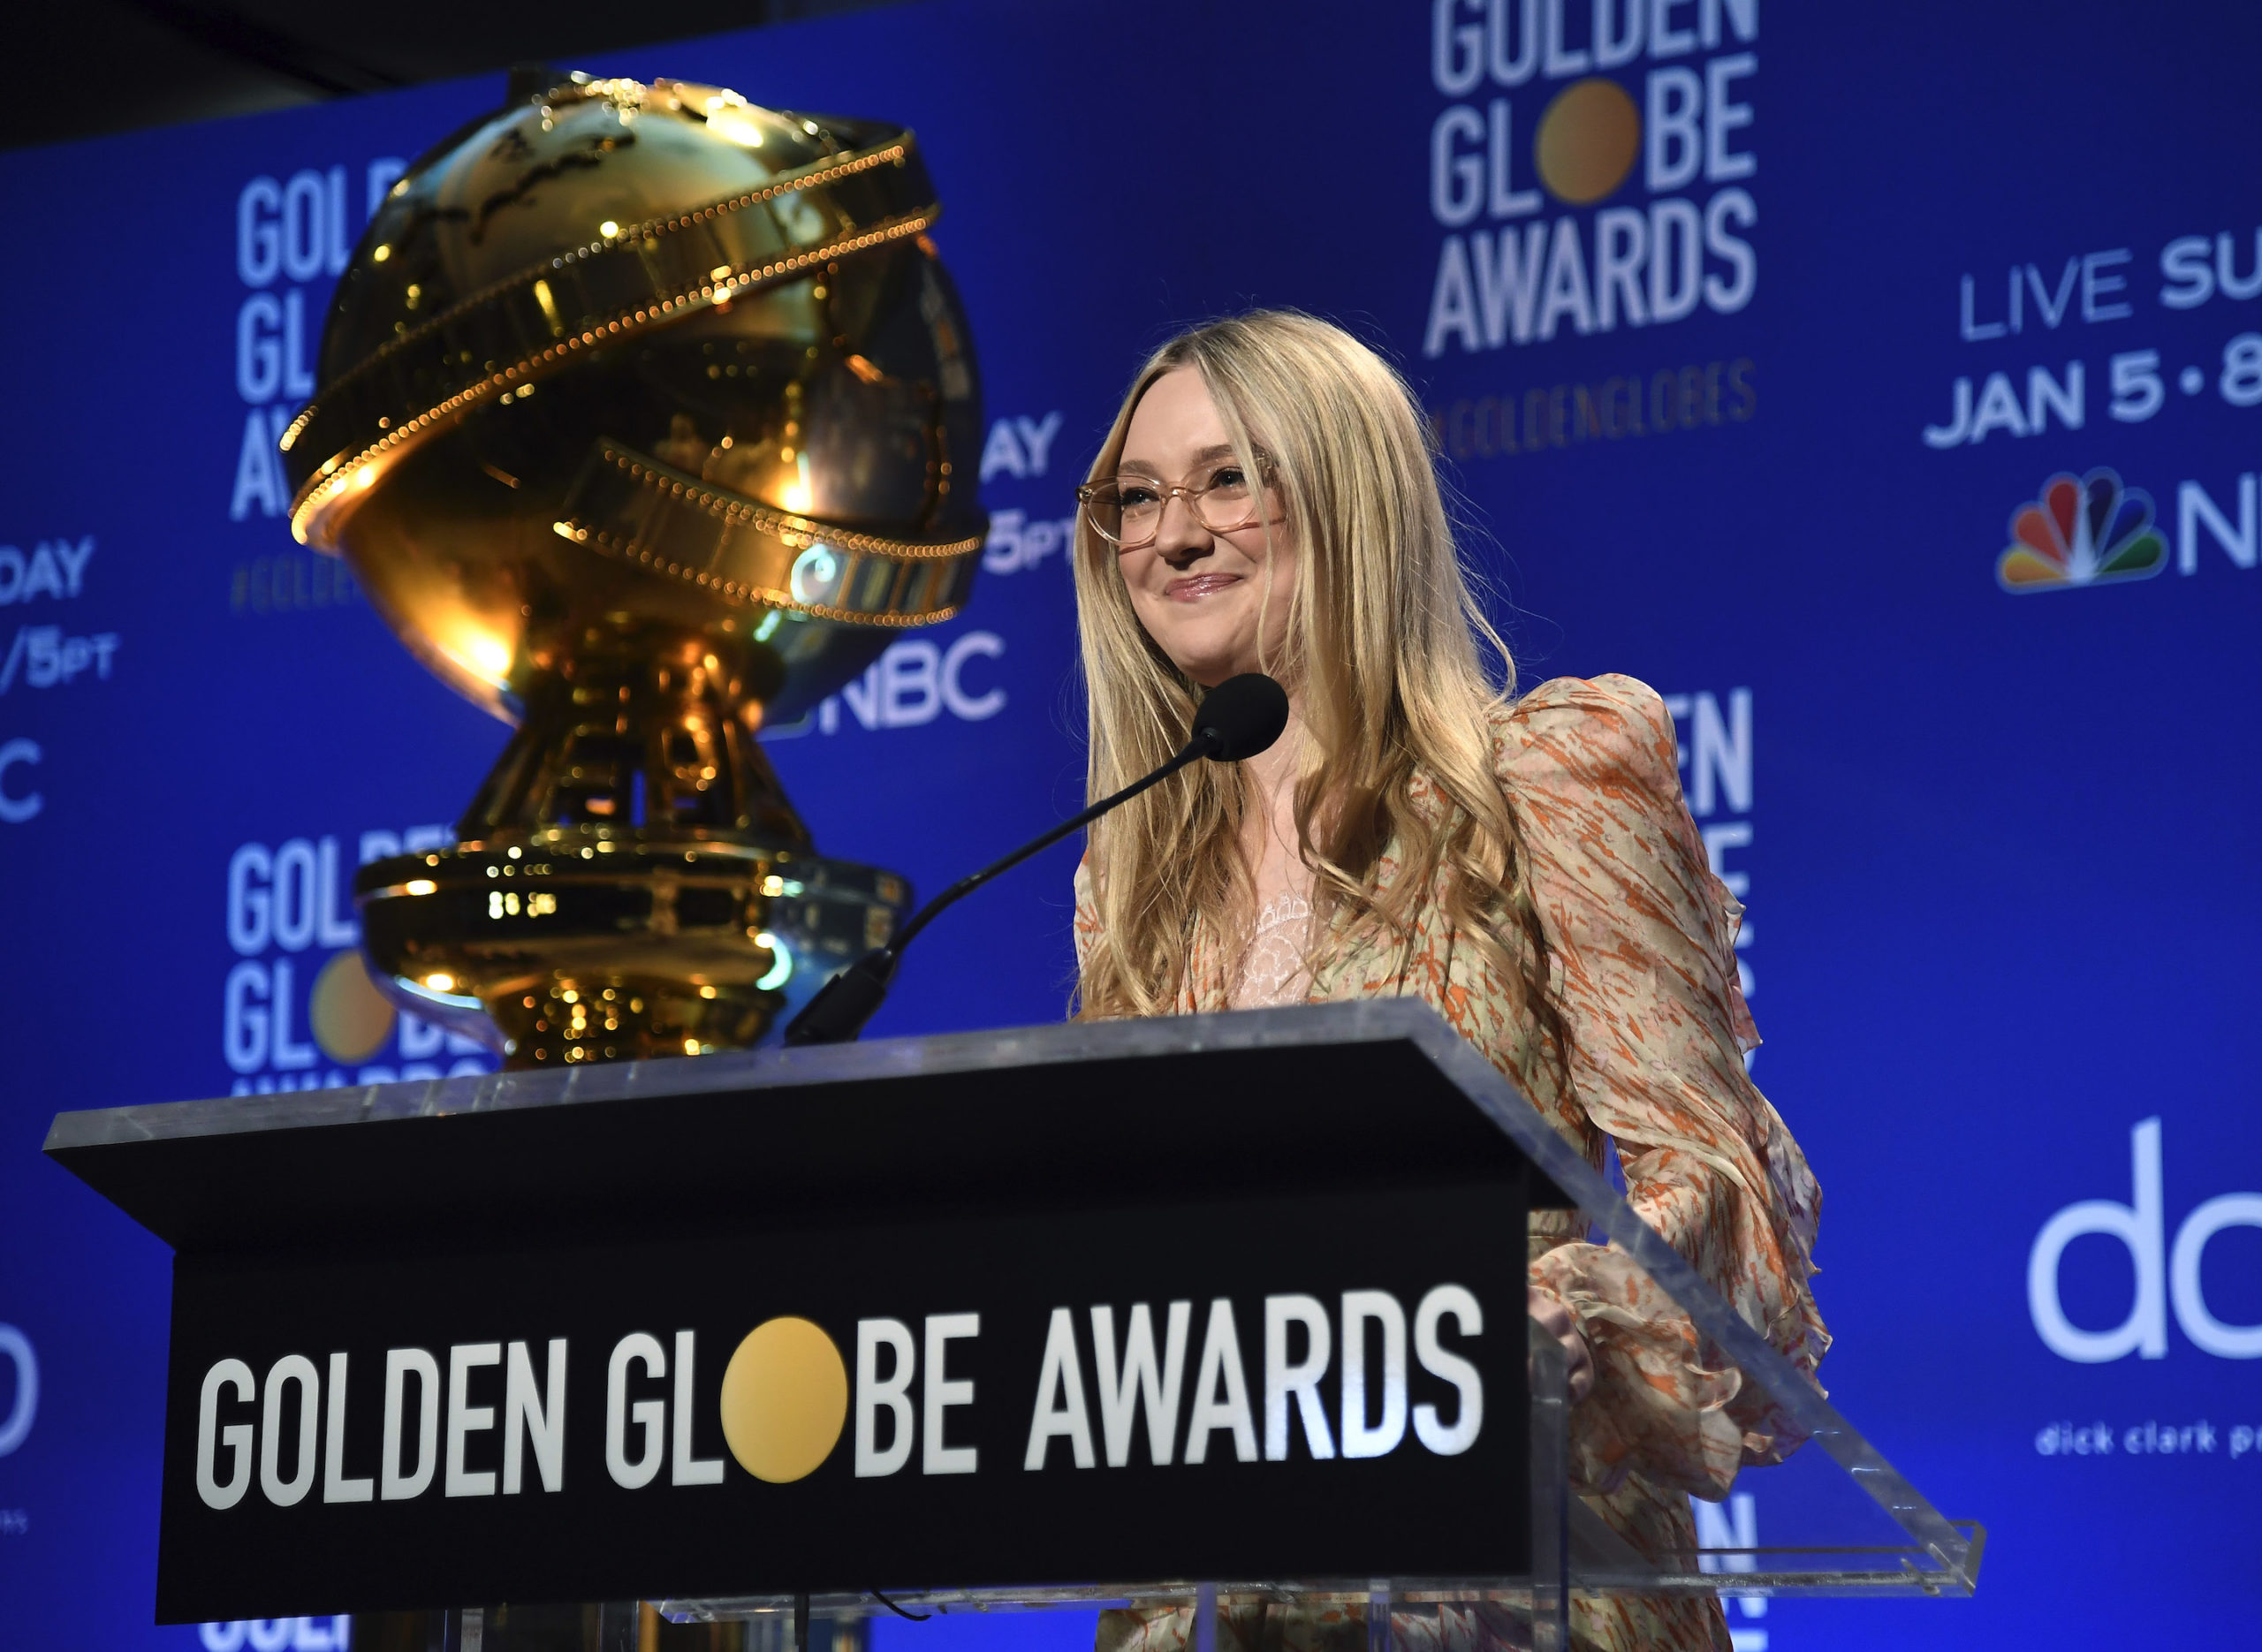 golden globe scaled